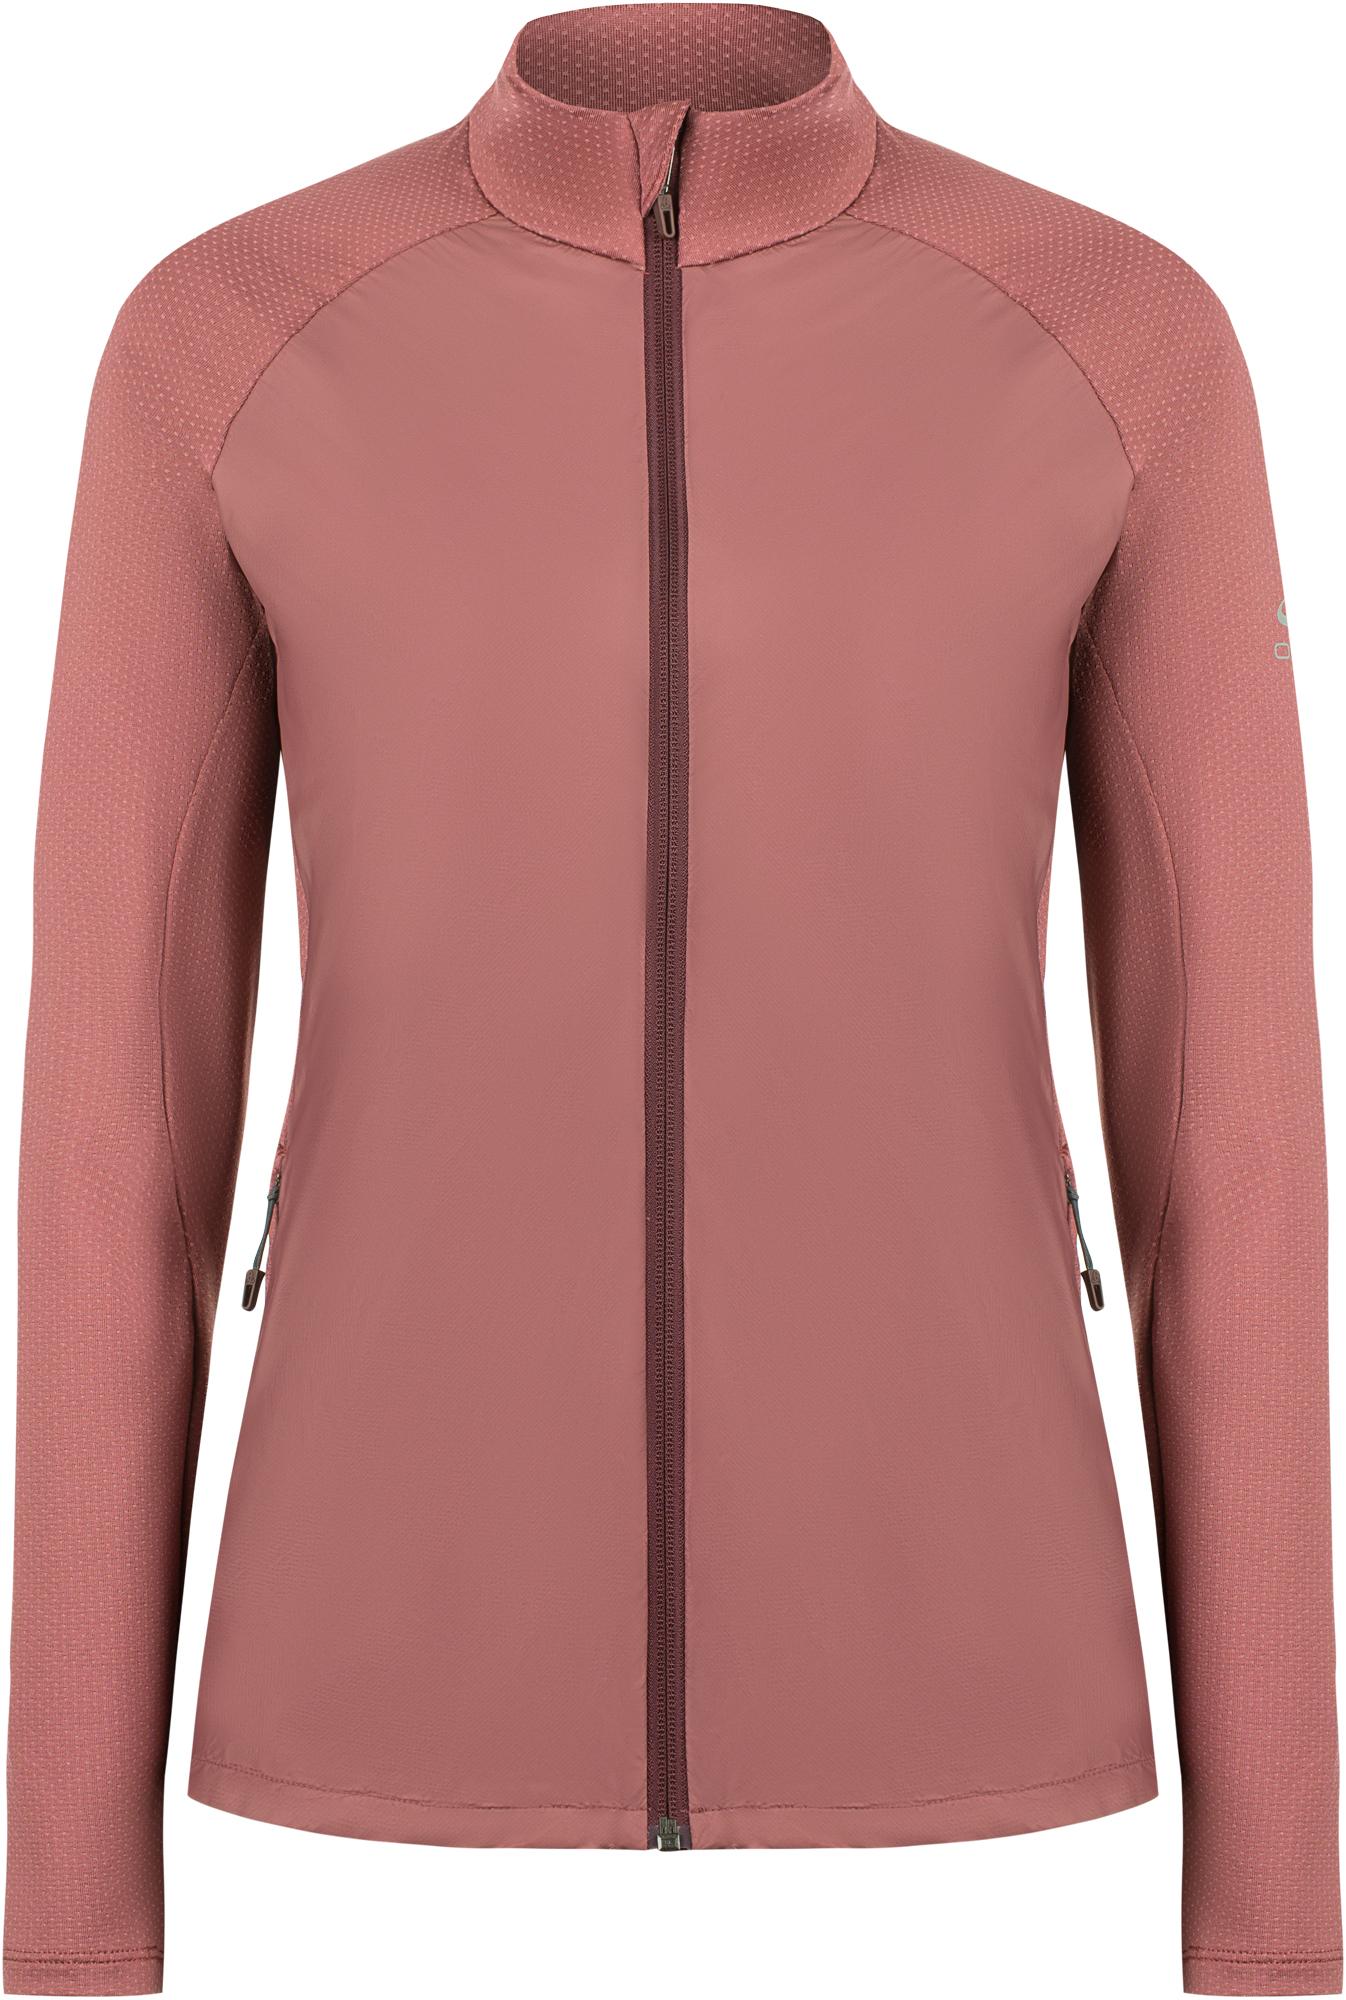 Odlo Куртка женская Velocity Element, размер 46-48